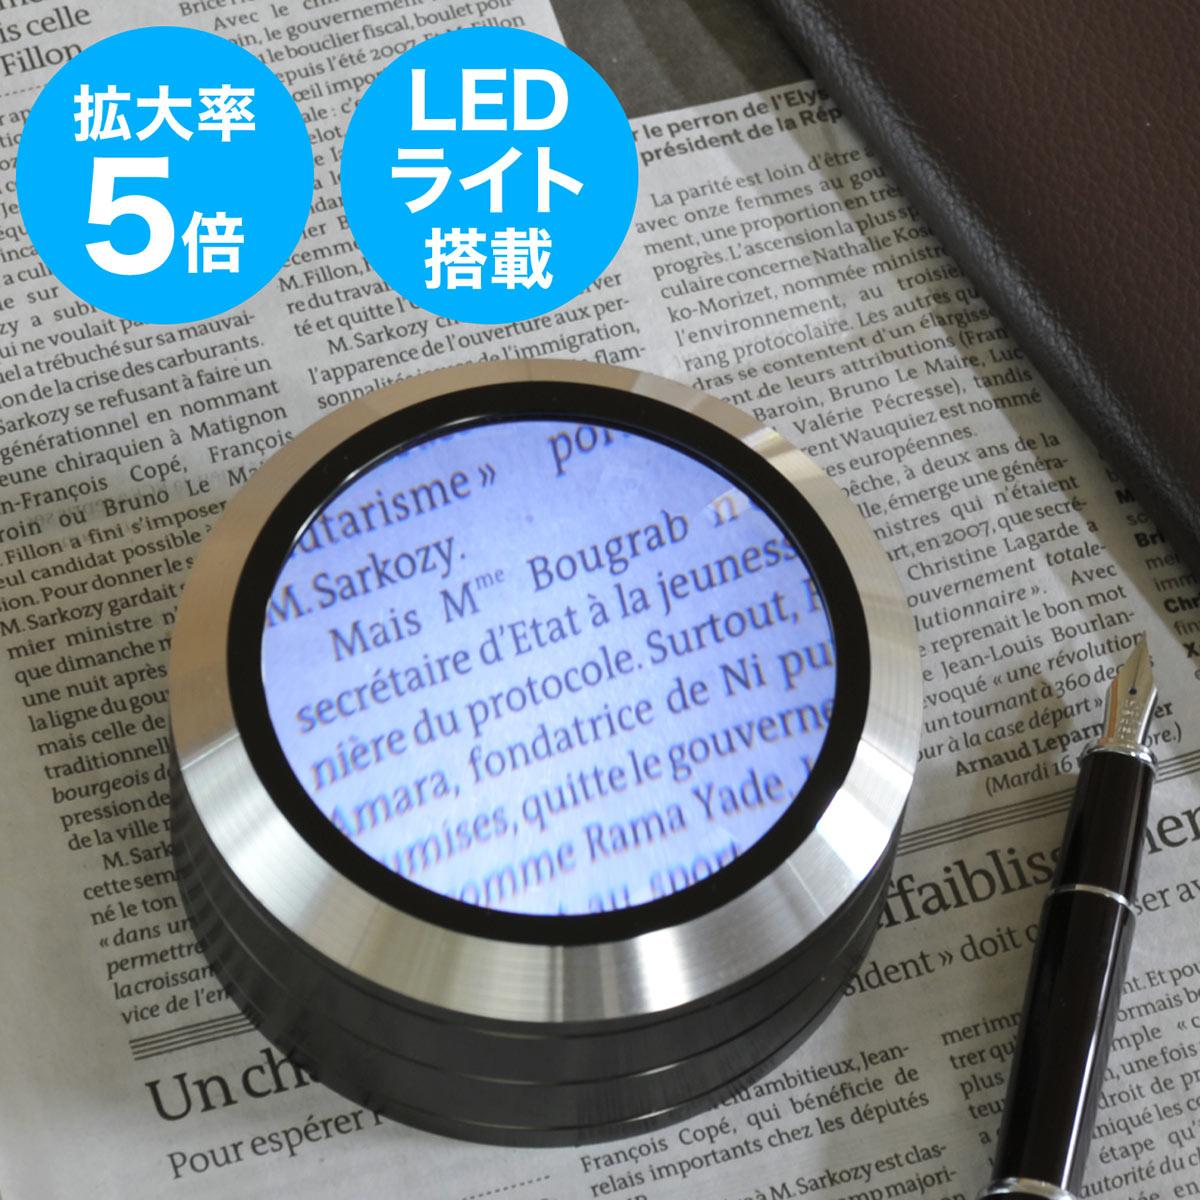 400-CAM013 サンワダイレクト限定品 送料無料 バースデー 記念日 ギフト 贈物 お勧め 通販 無料サンプルOK 拡大鏡 ルーペ 5倍 虫眼鏡 敬老の日 高級感あるおしゃれなデザイン プレゼントに最適 LEDライト付きで明るい